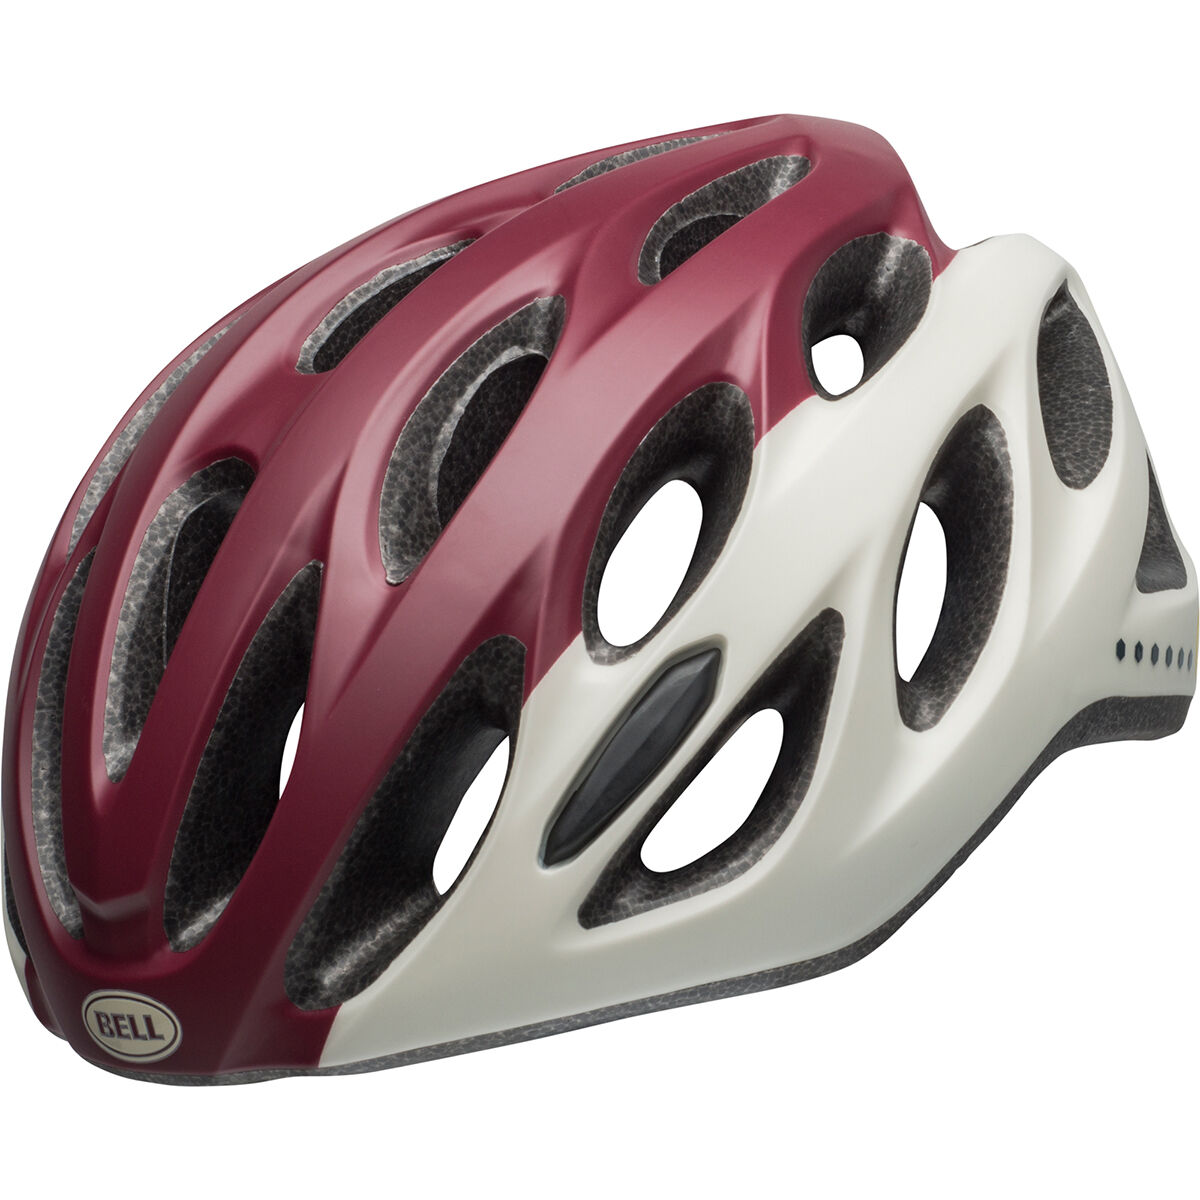 Bell Women's Tempo Cycling Helmet